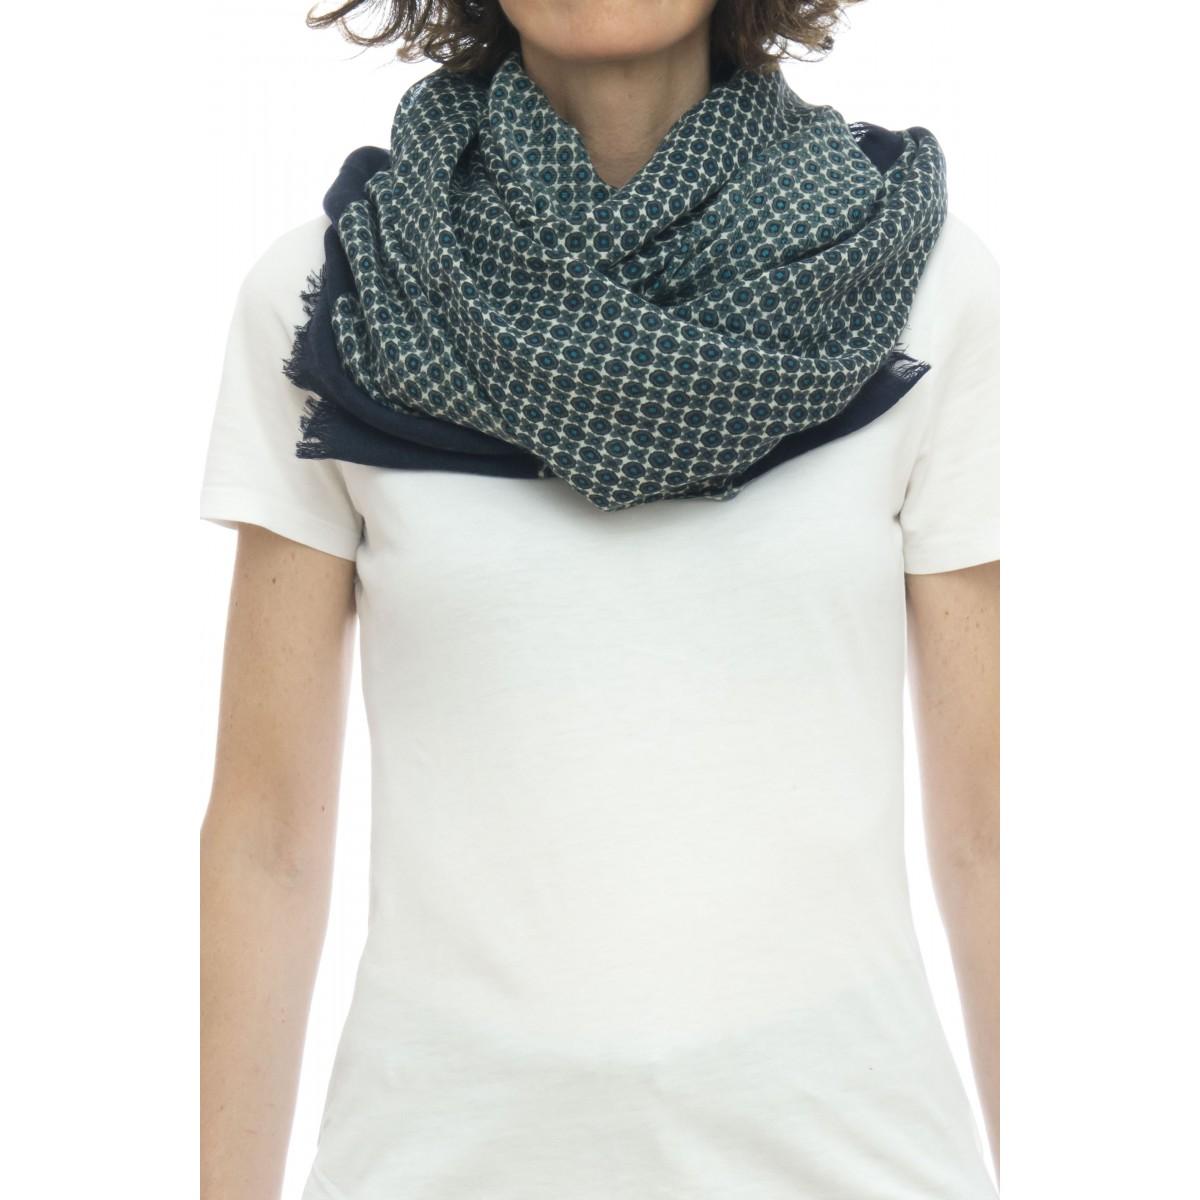 Sciarpa - Margherita 4517   100% lana, 70 x 200